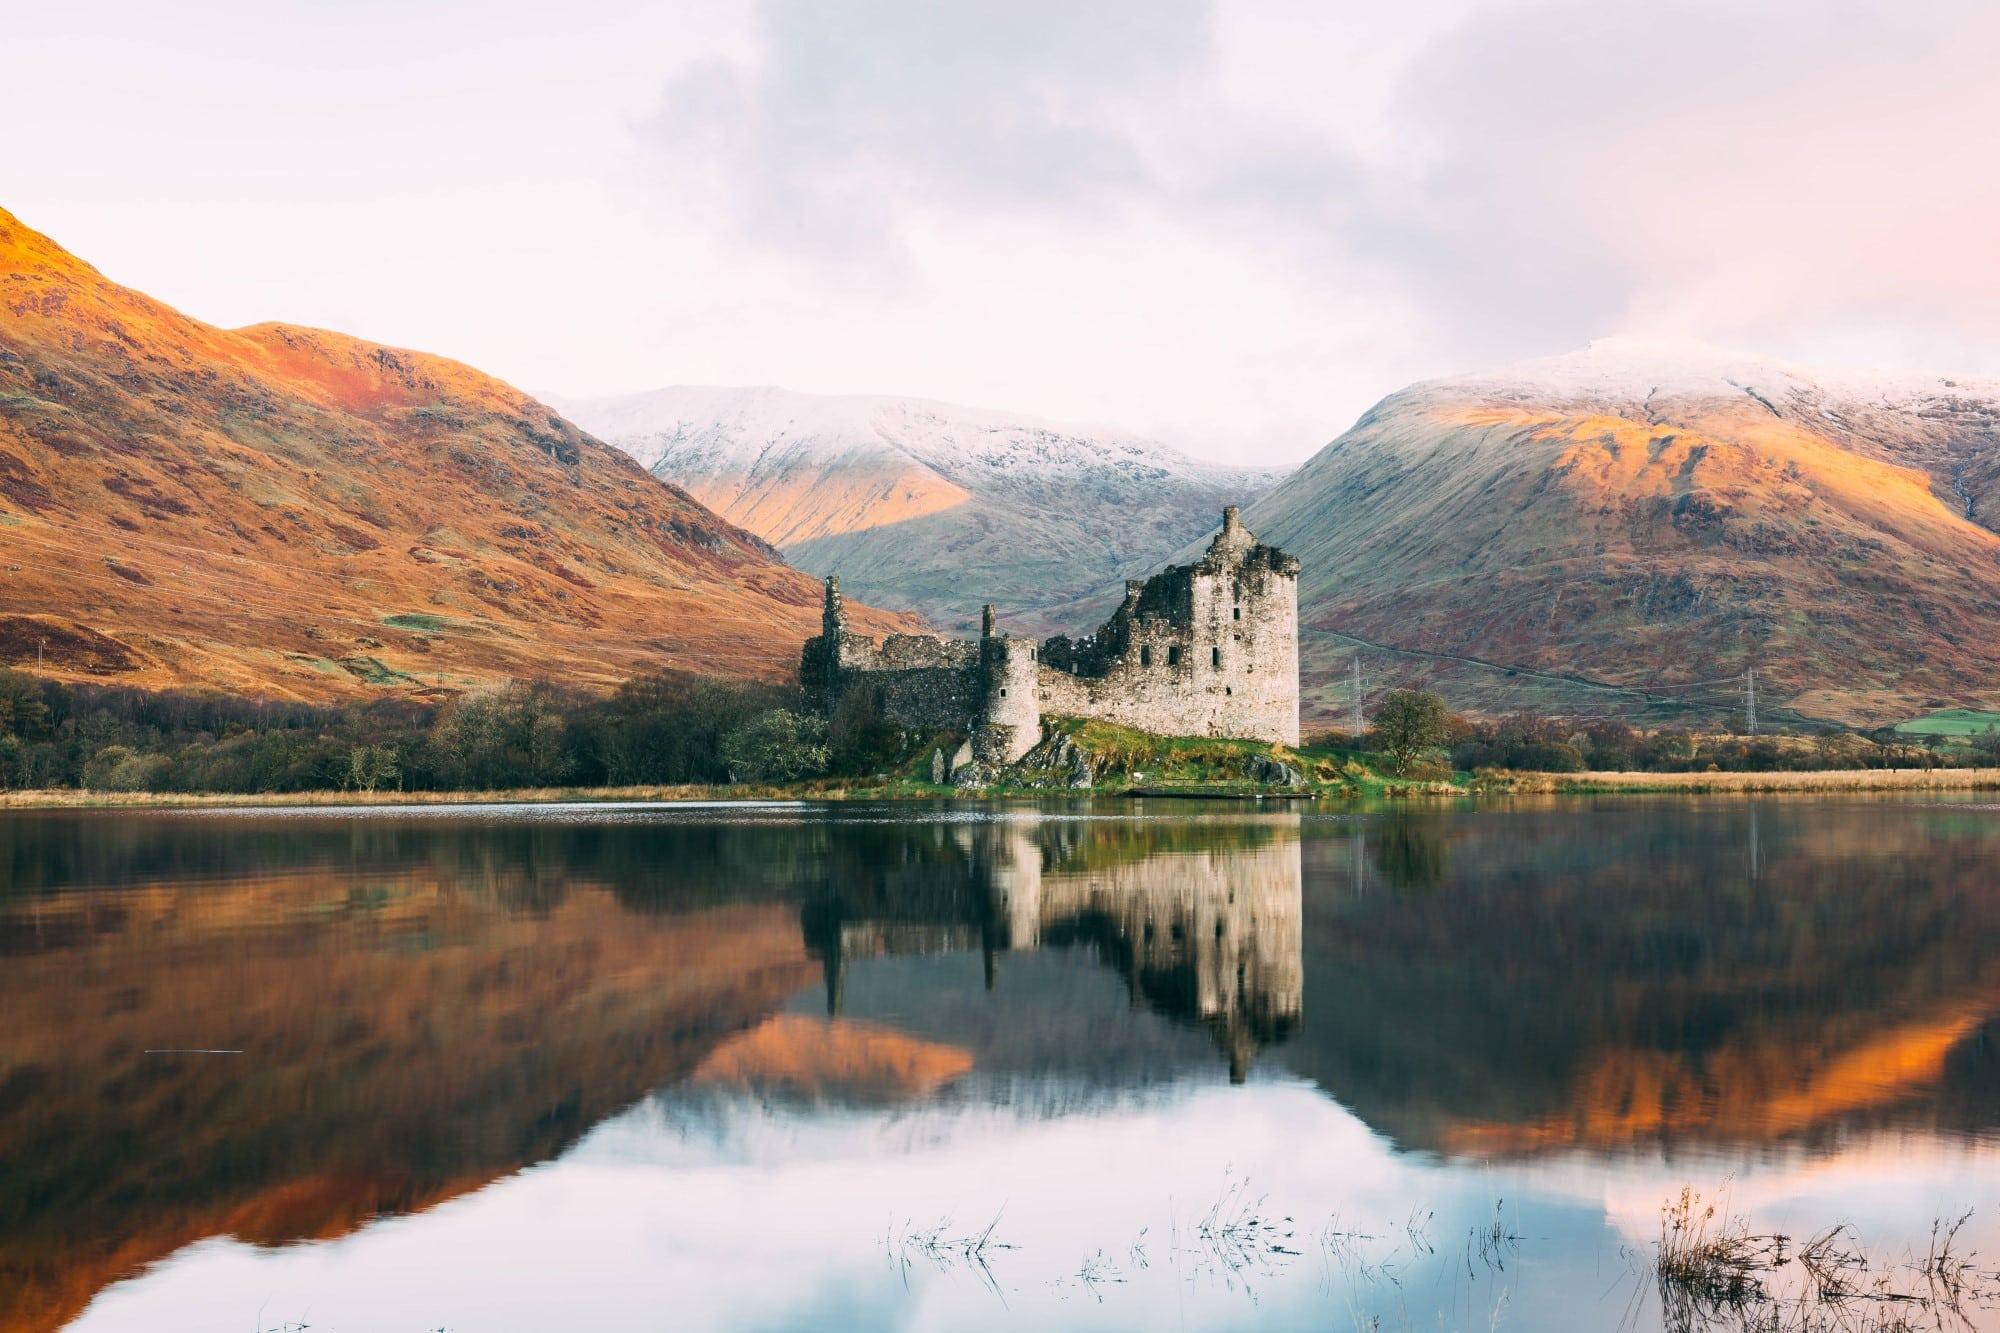 Take a tour around Scotland with scotch whisky